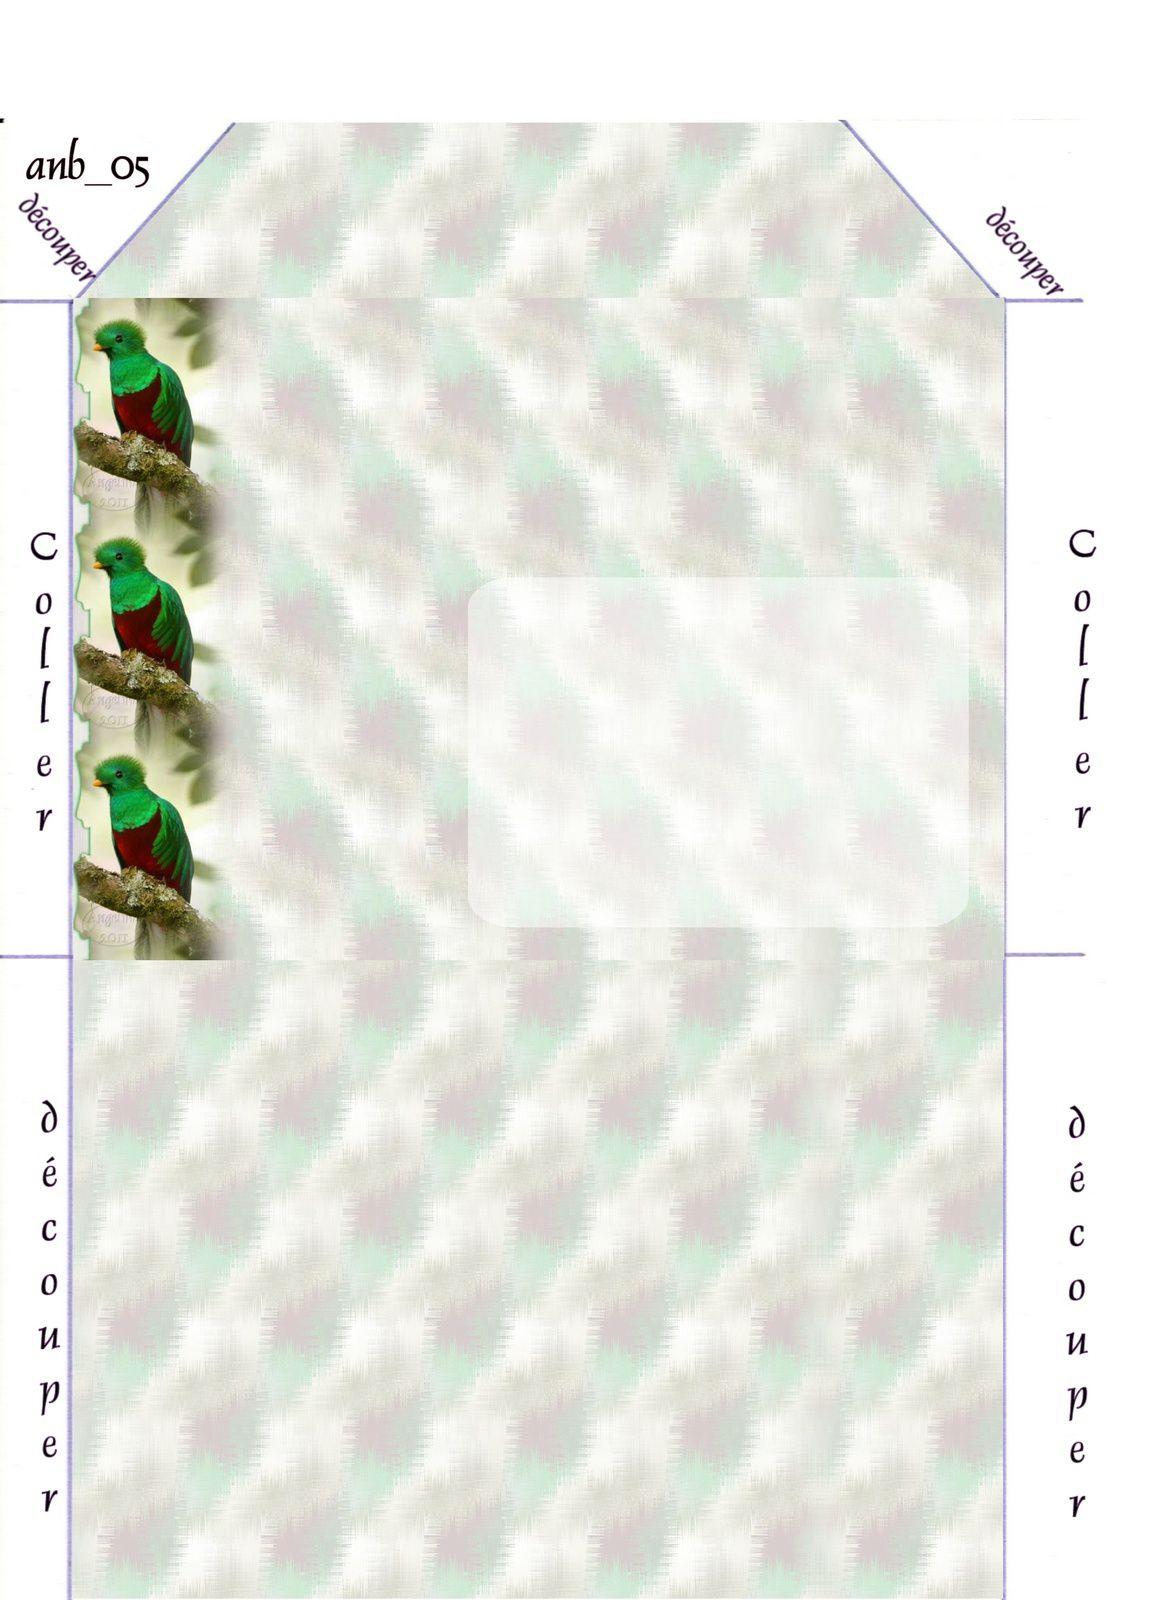 Quetzal resplendent Incredimail &amp&#x3B; Papier A4 h l &amp&#x3B; outlook &amp&#x3B; enveloppe &amp&#x3B; 2 cartes A5 &amp&#x3B; signets 3 langues     ois_quetzal_resplendent_00_micheline